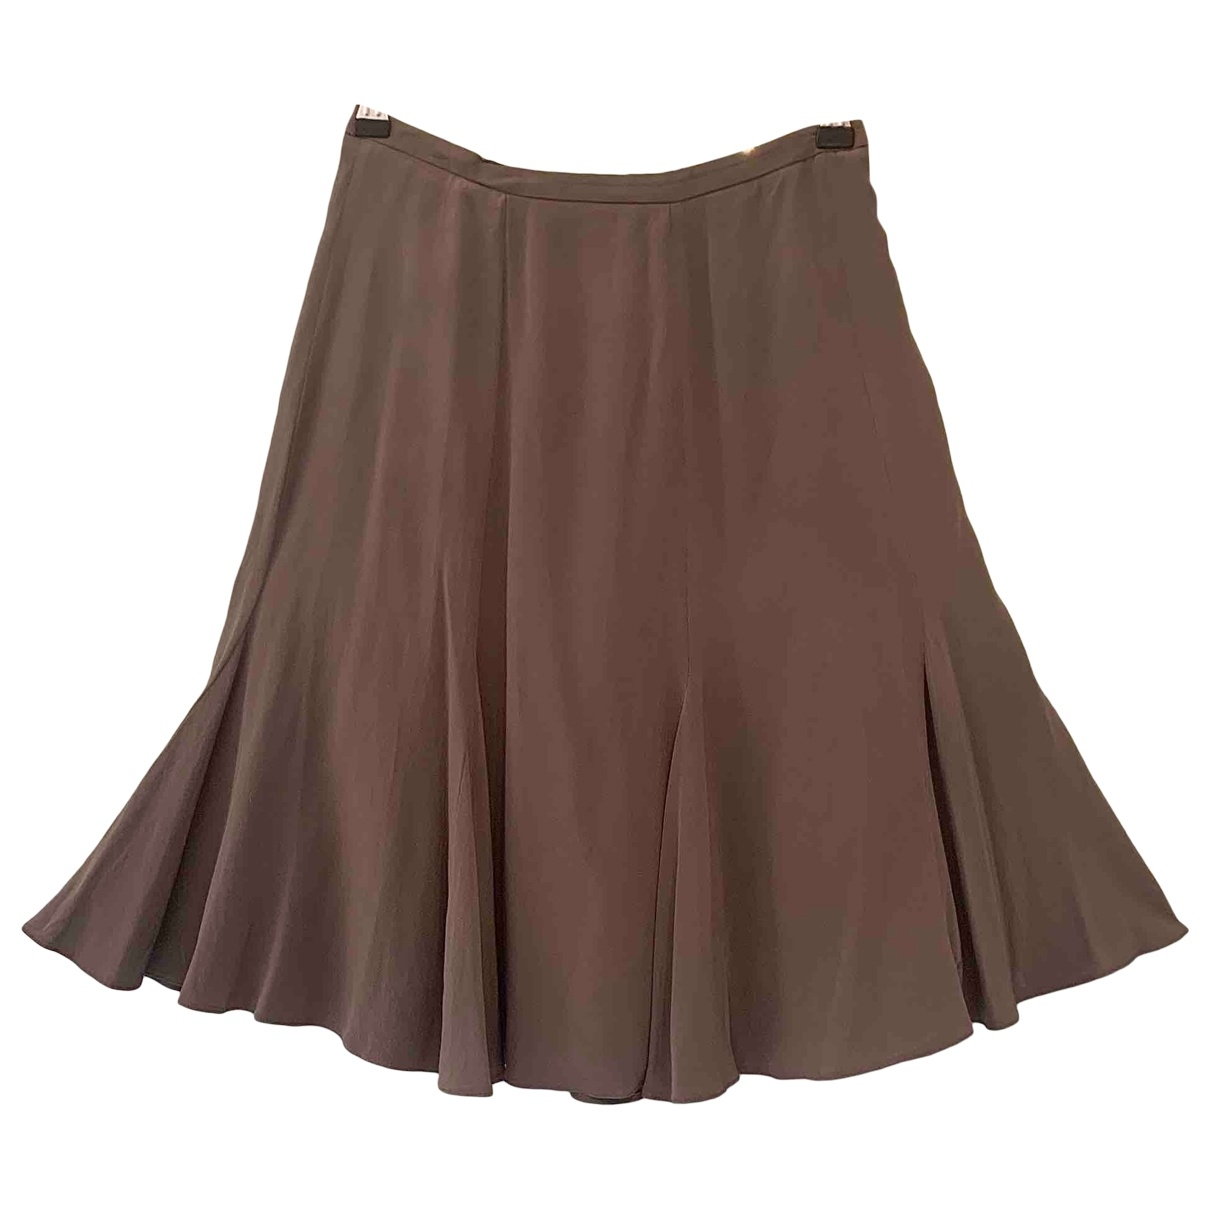 Giorgio Armani \N Anthracite Silk skirt for Women 42 IT